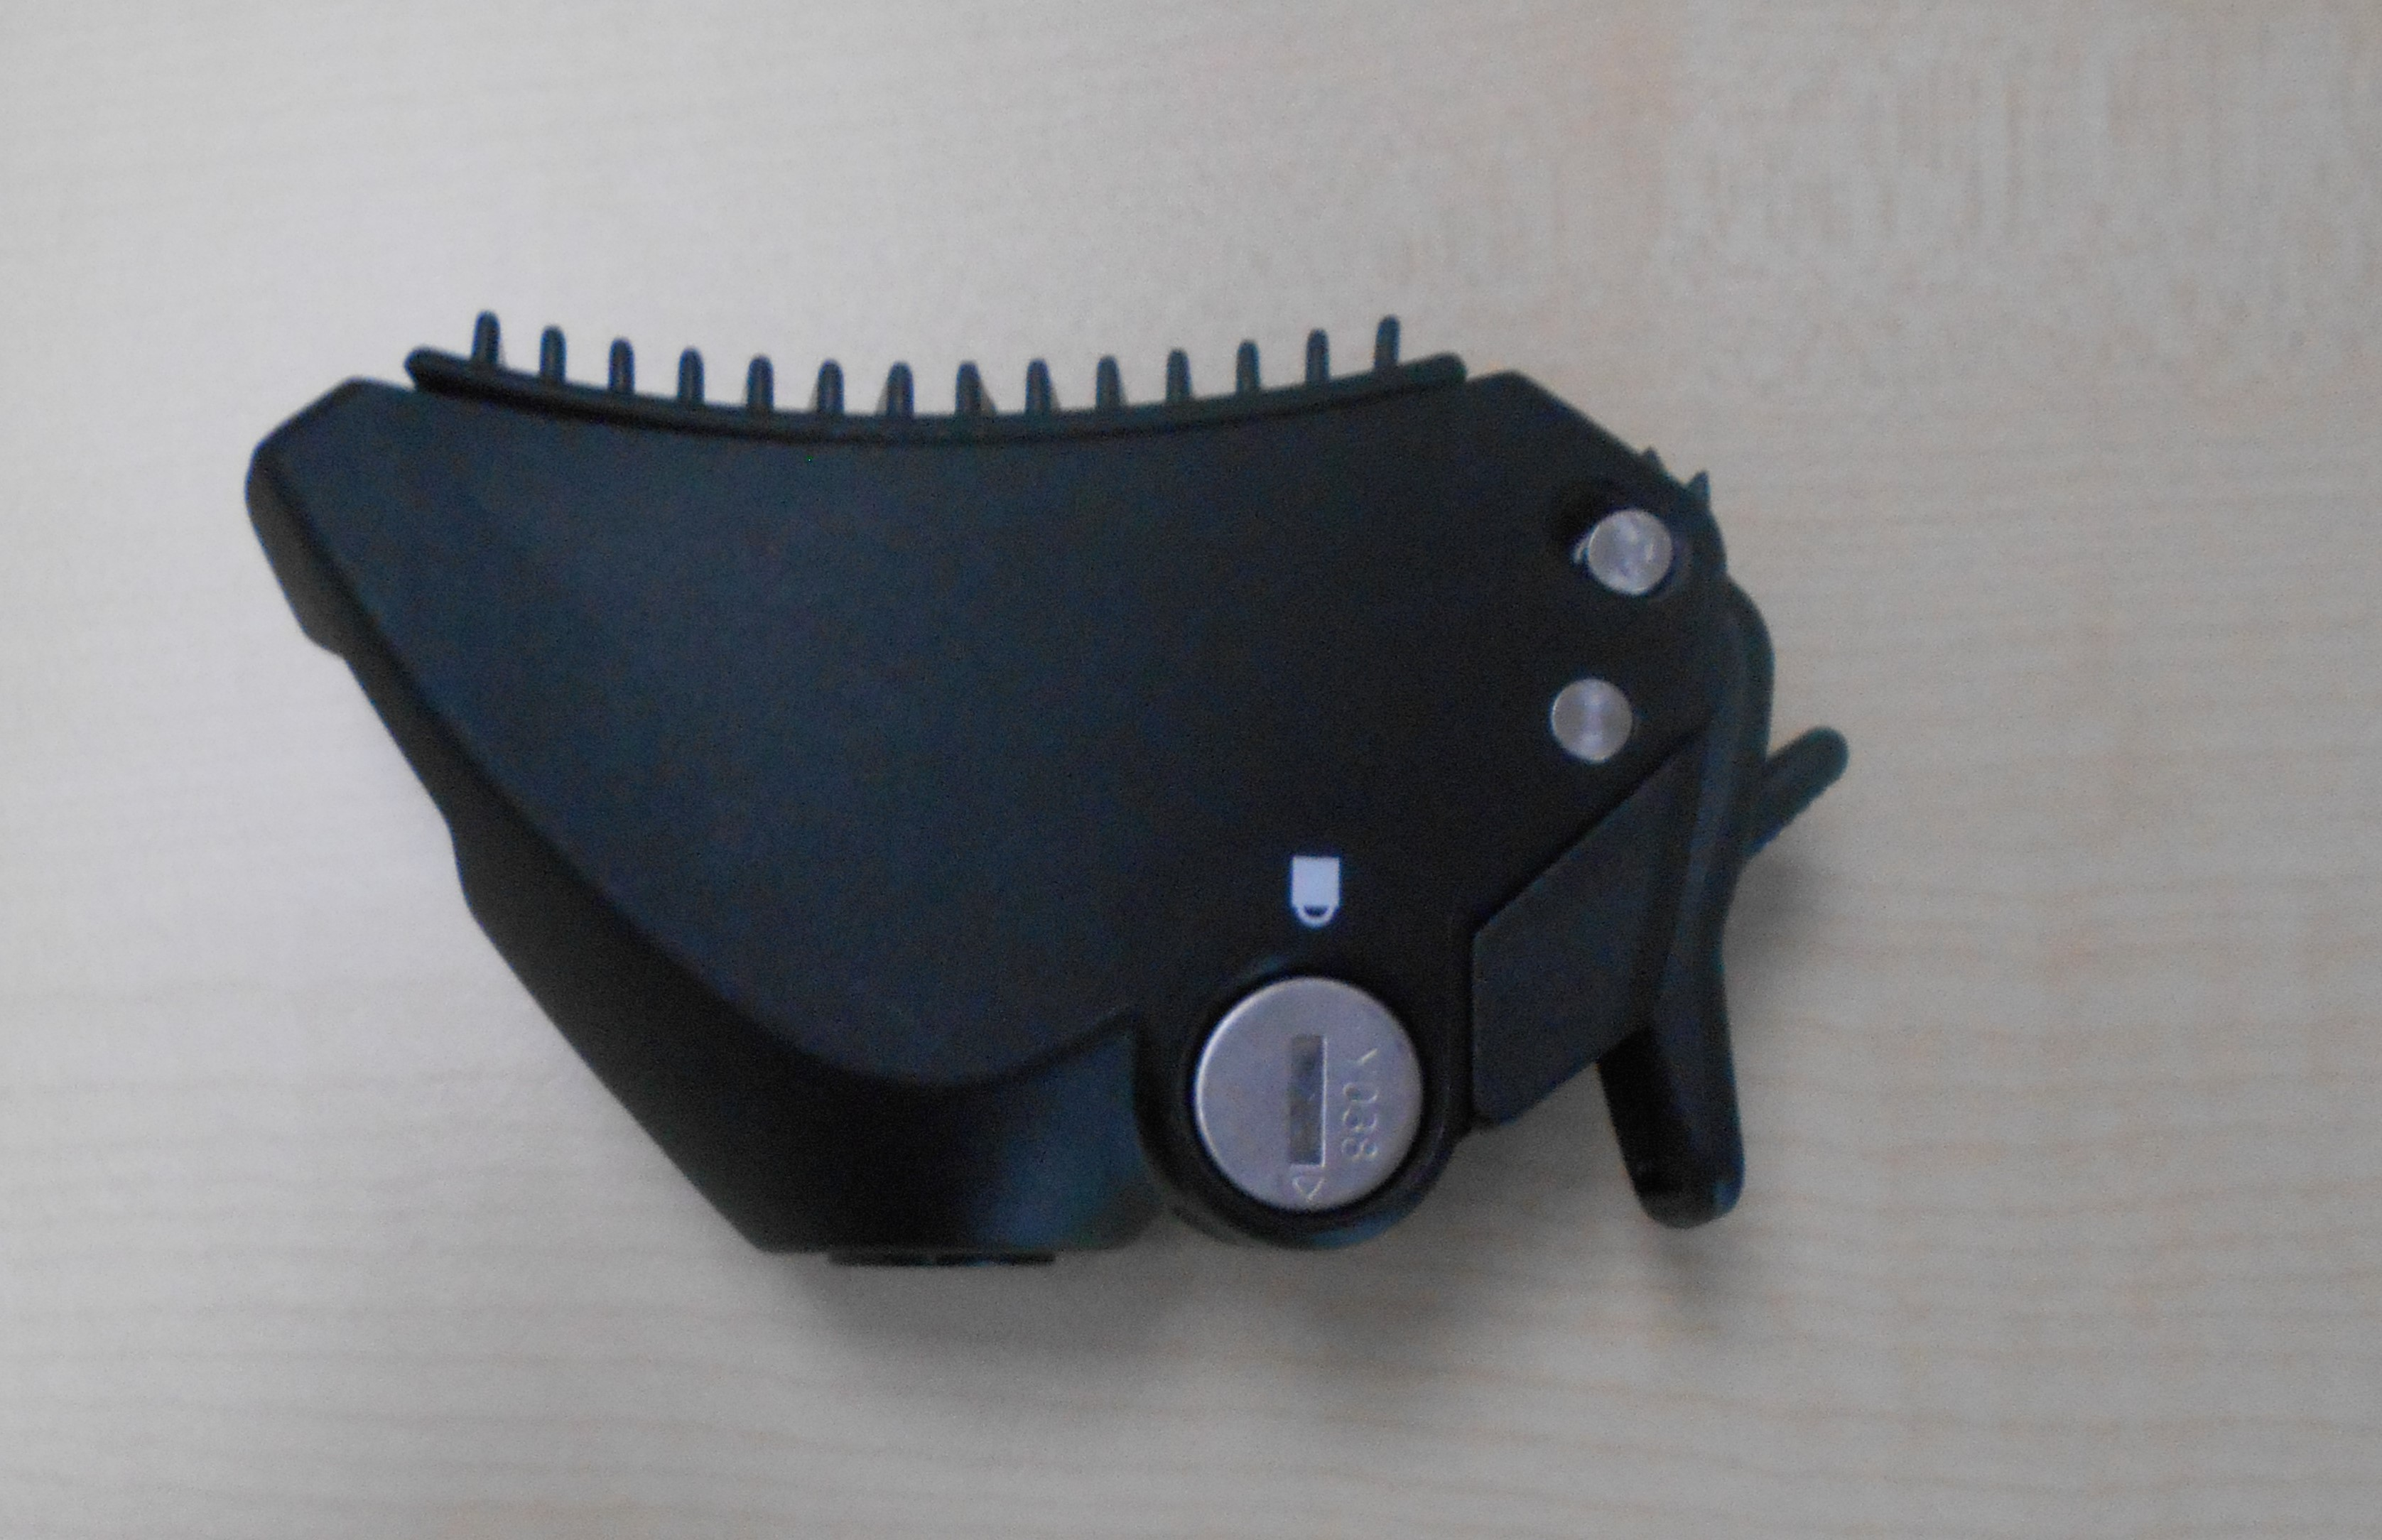 Kopf E-Bike Rahmenhalter mit Schlosscode Y006